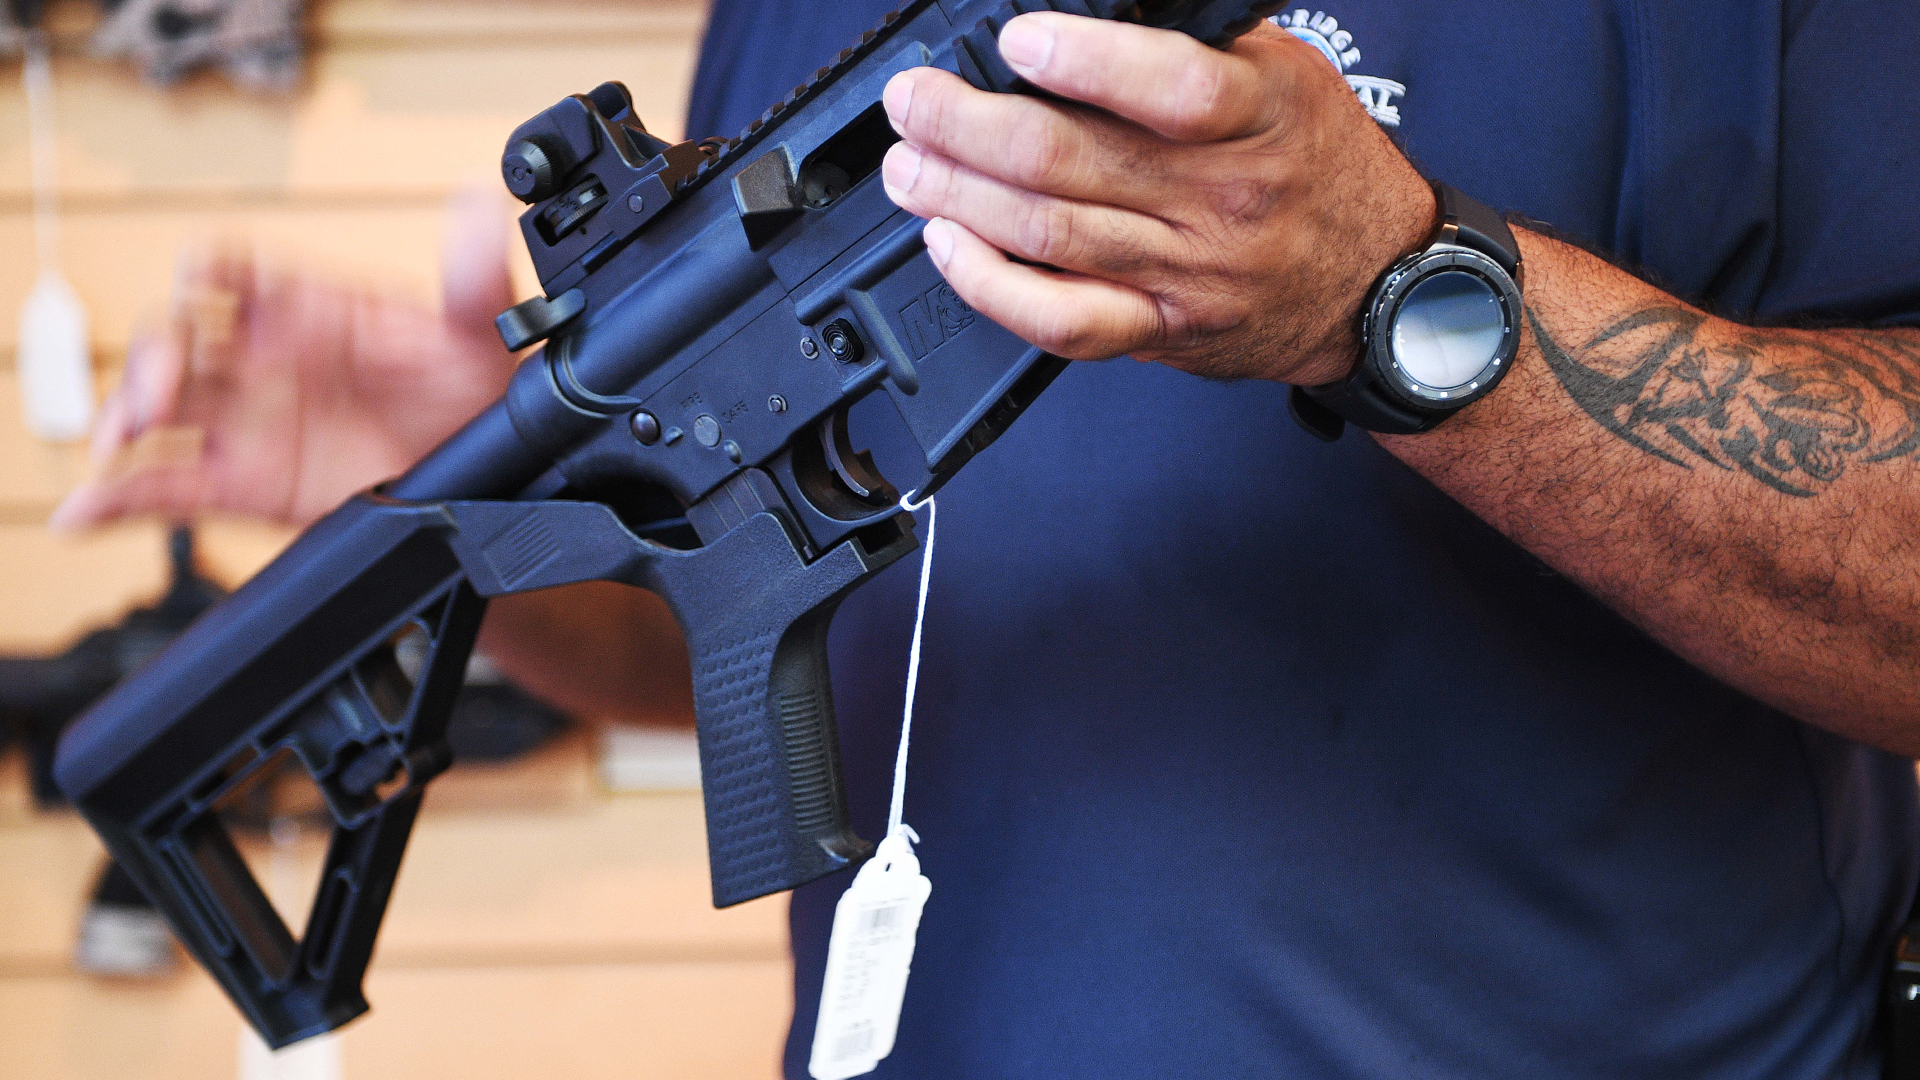 Gun salesman Mark Warner shows a bump stock installed on an AR-15 rifle at Blue Ridge Arsenal in Chantilly, Virgina, on Oct. 6, 2017. (Credit: Jim Watson/AFP/Getty Images)